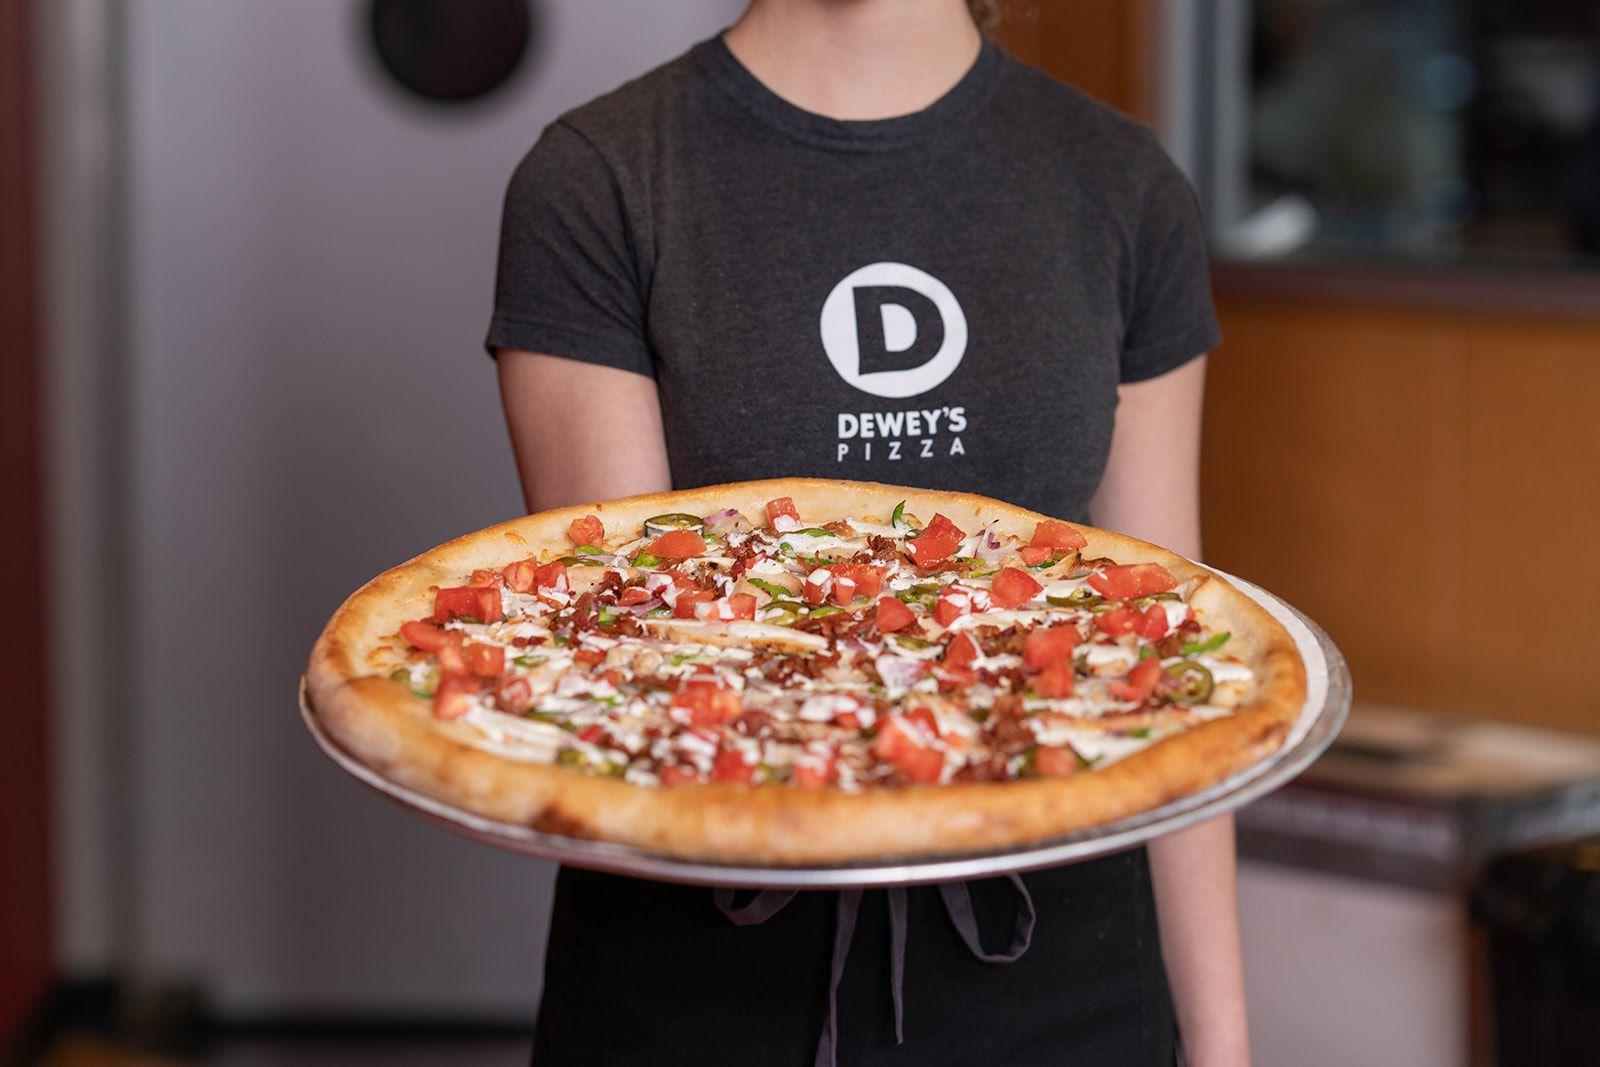 Deweys pizza 1